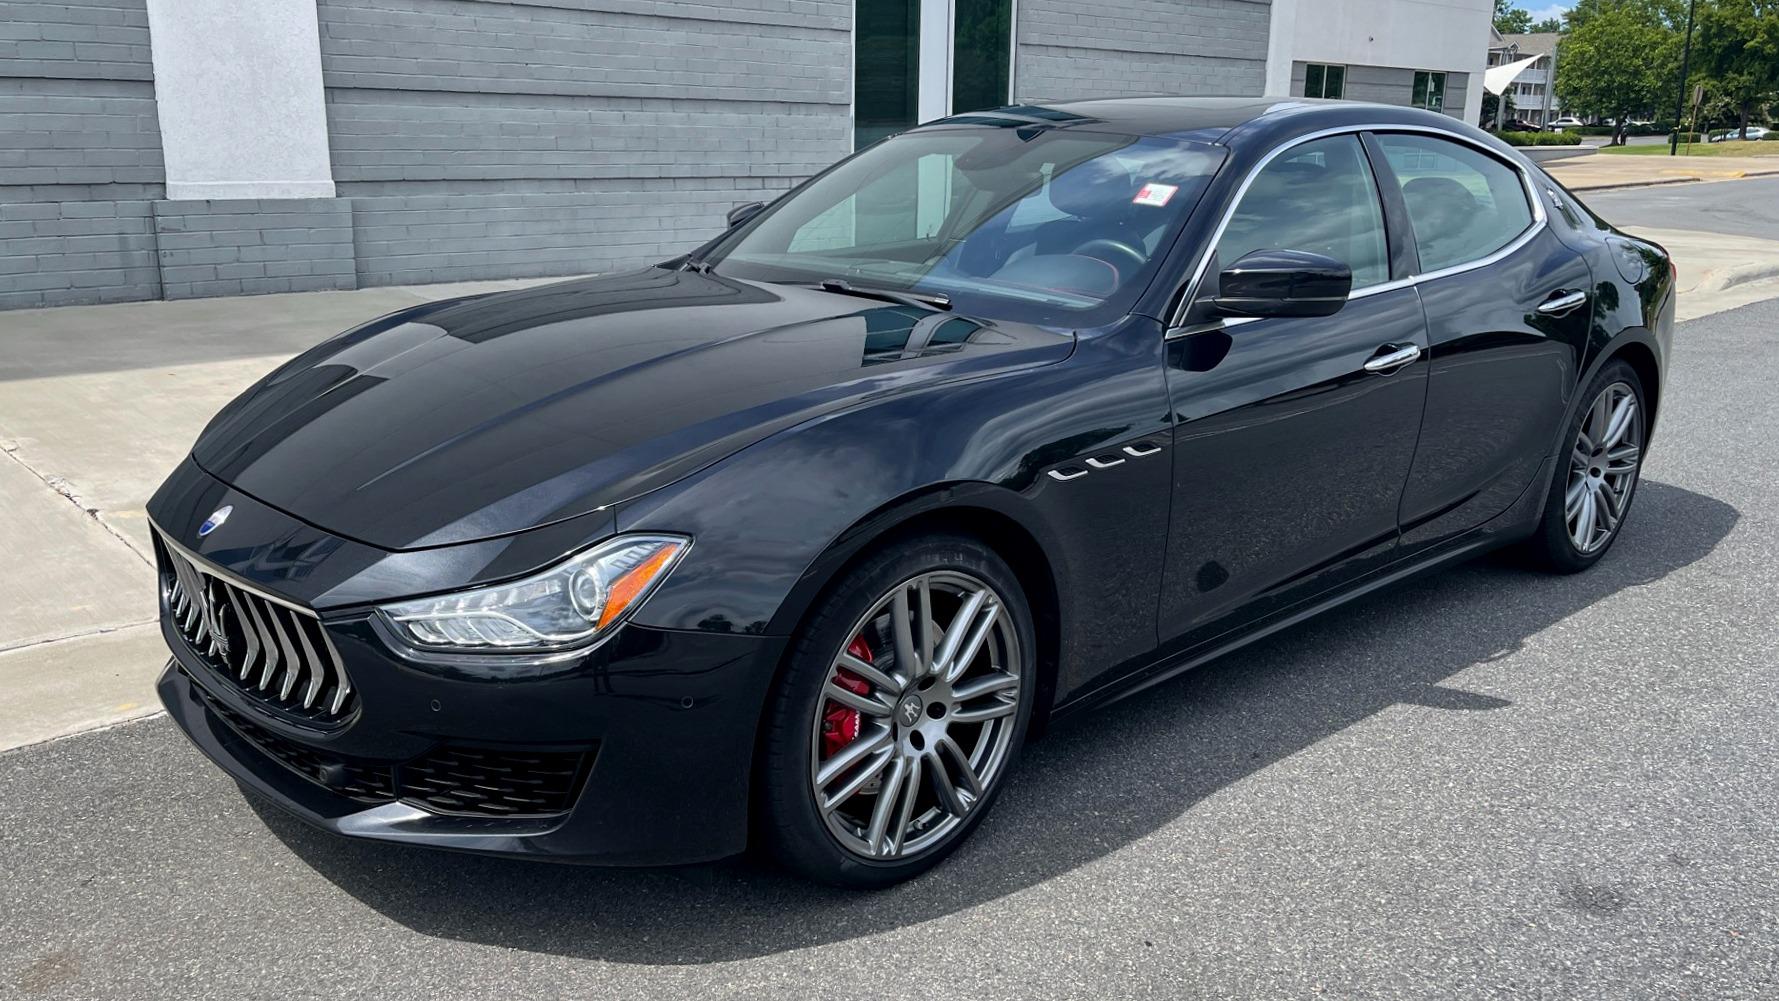 Used 2018 Maserati GHIBLI S Q4 SEDAN / AWD / 3.0L V6 / SUNROOF / NAV / REARVIEW for sale $51,995 at Formula Imports in Charlotte NC 28227 2